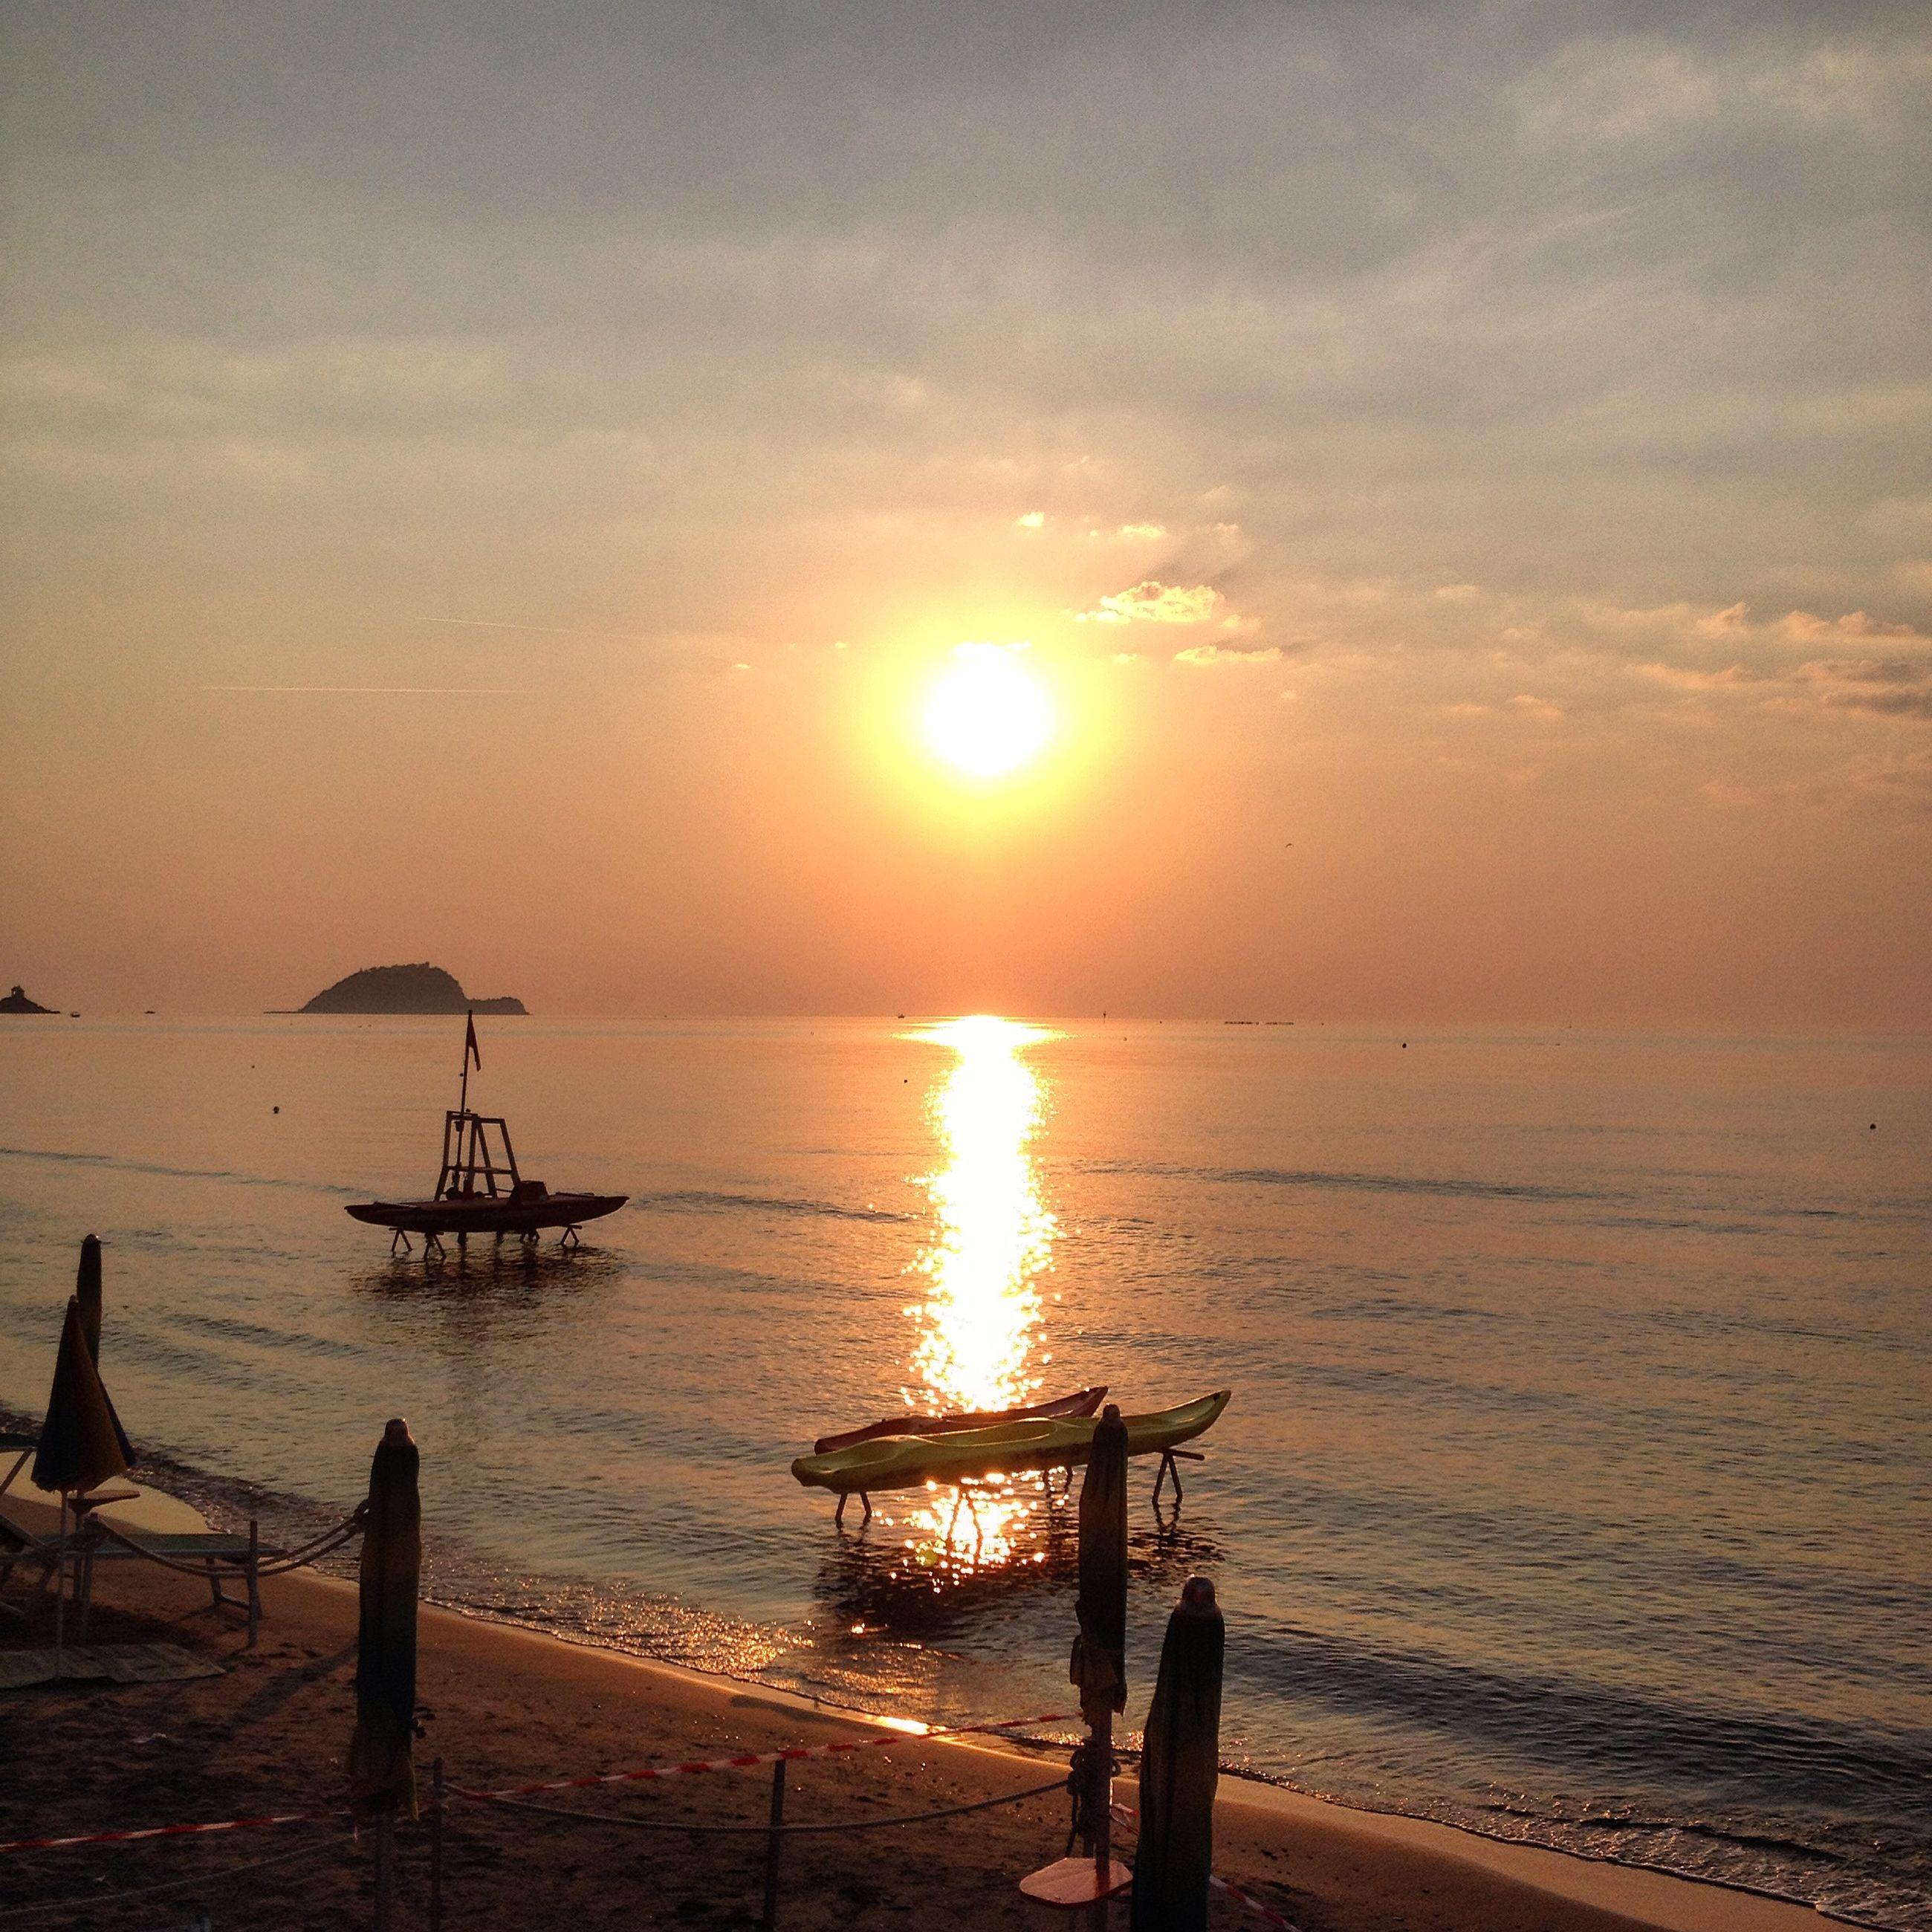 sunset, water, sea, sun, horizon over water, nautical vessel, transportation, scenics, sky, beauty in nature, tranquility, tranquil scene, orange color, boat, silhouette, mode of transport, nature, sunlight, idyllic, sunbeam